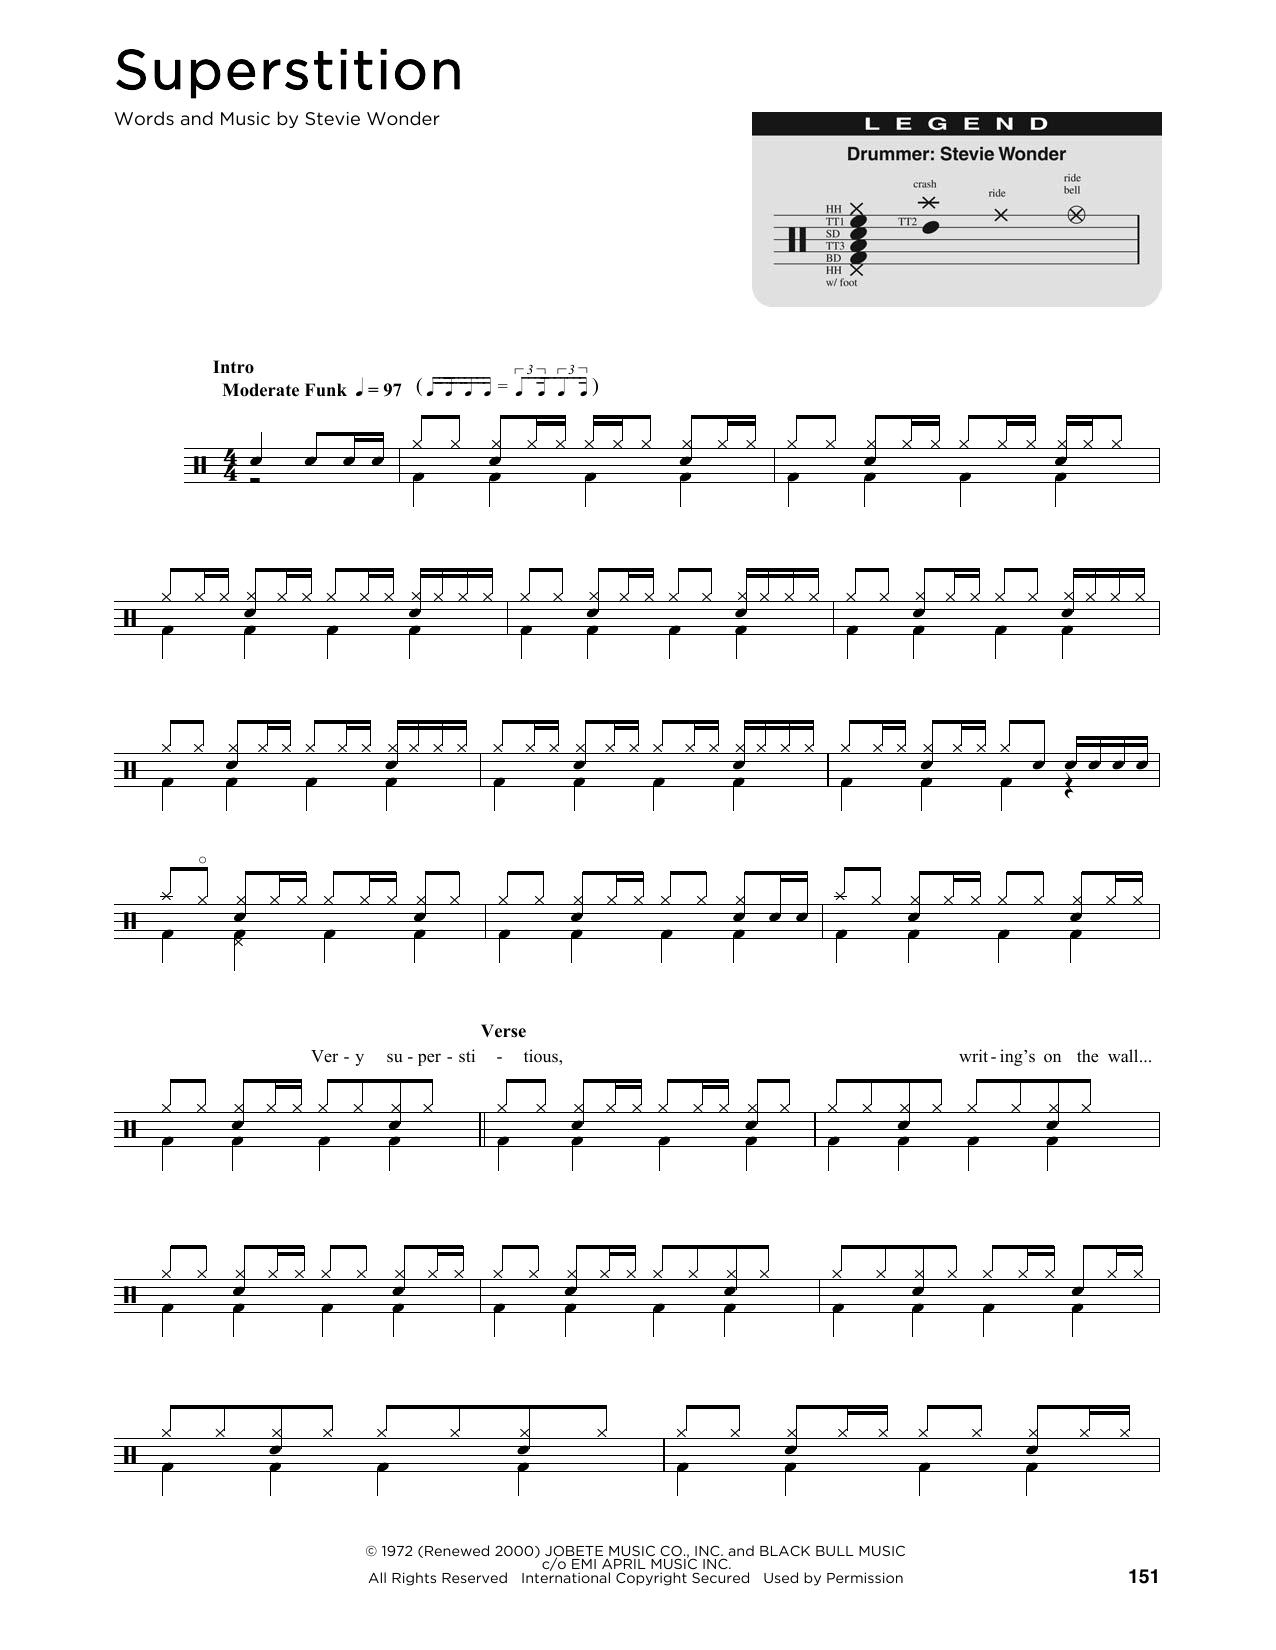 Superstition Sheet Music | Stevie Wonder | Drums Transcription - Free Printable Gospel Sheet Music For Piano